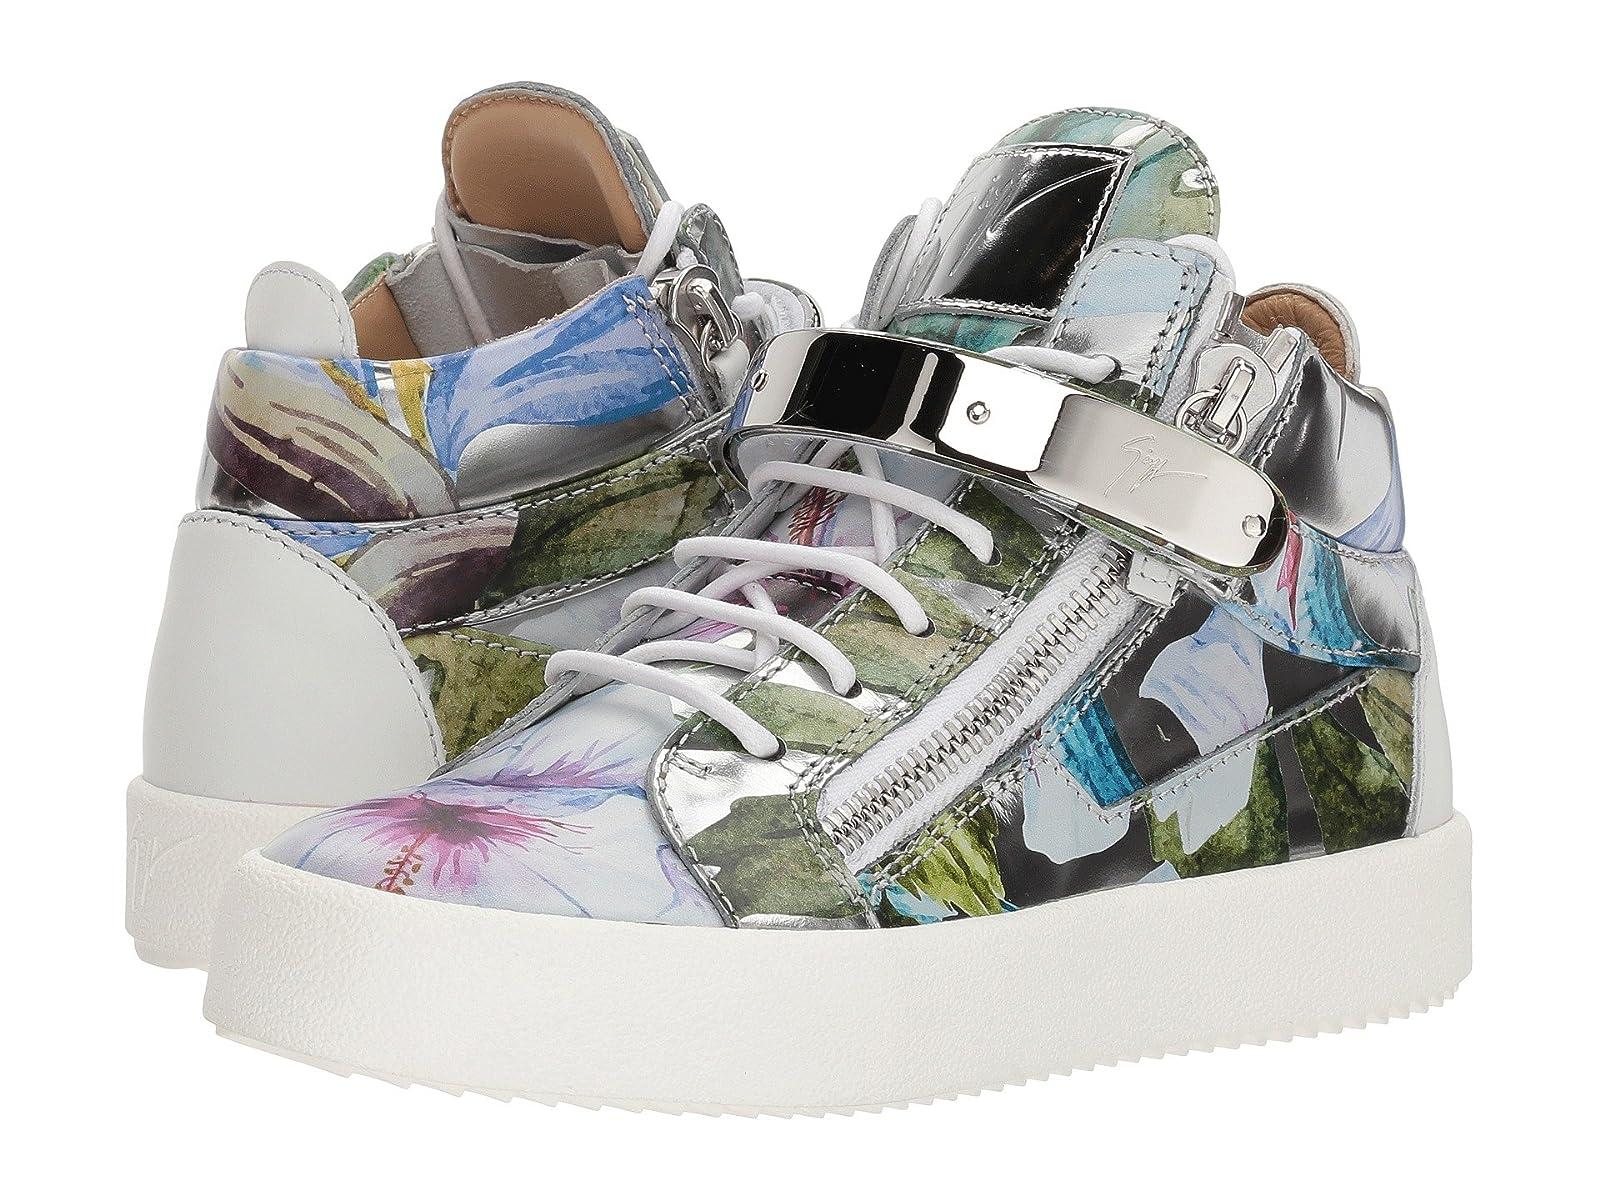 Giuseppe Zanotti RW70019Cheap and distinctive eye-catching shoes